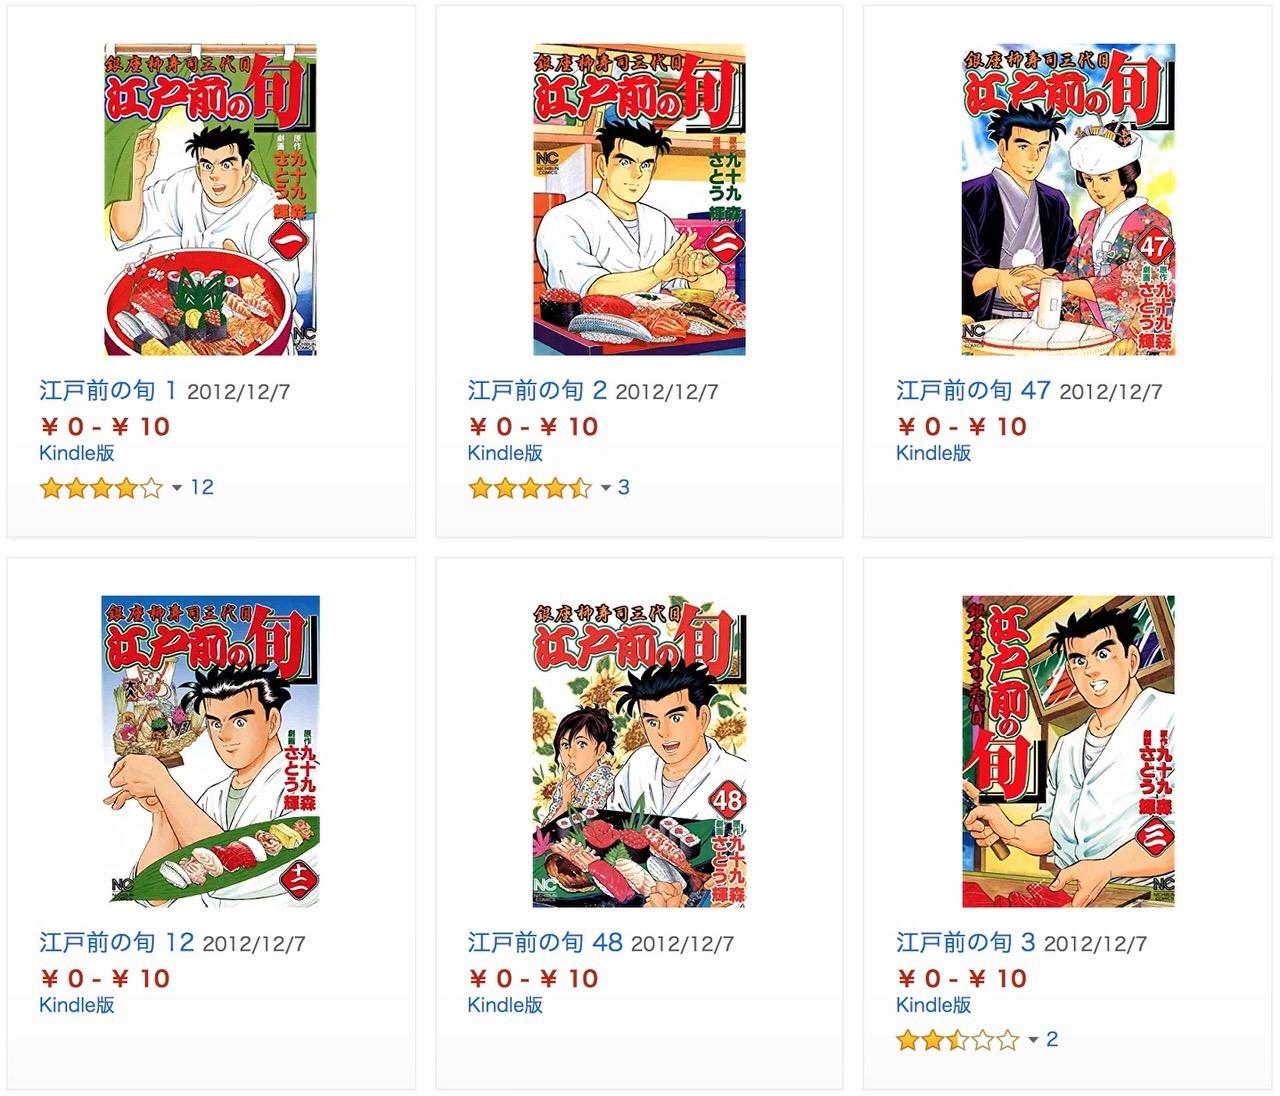 【Kindleセール】寿司マンガ「江戸前の旬」1巻10円セール開催中!50巻で500円